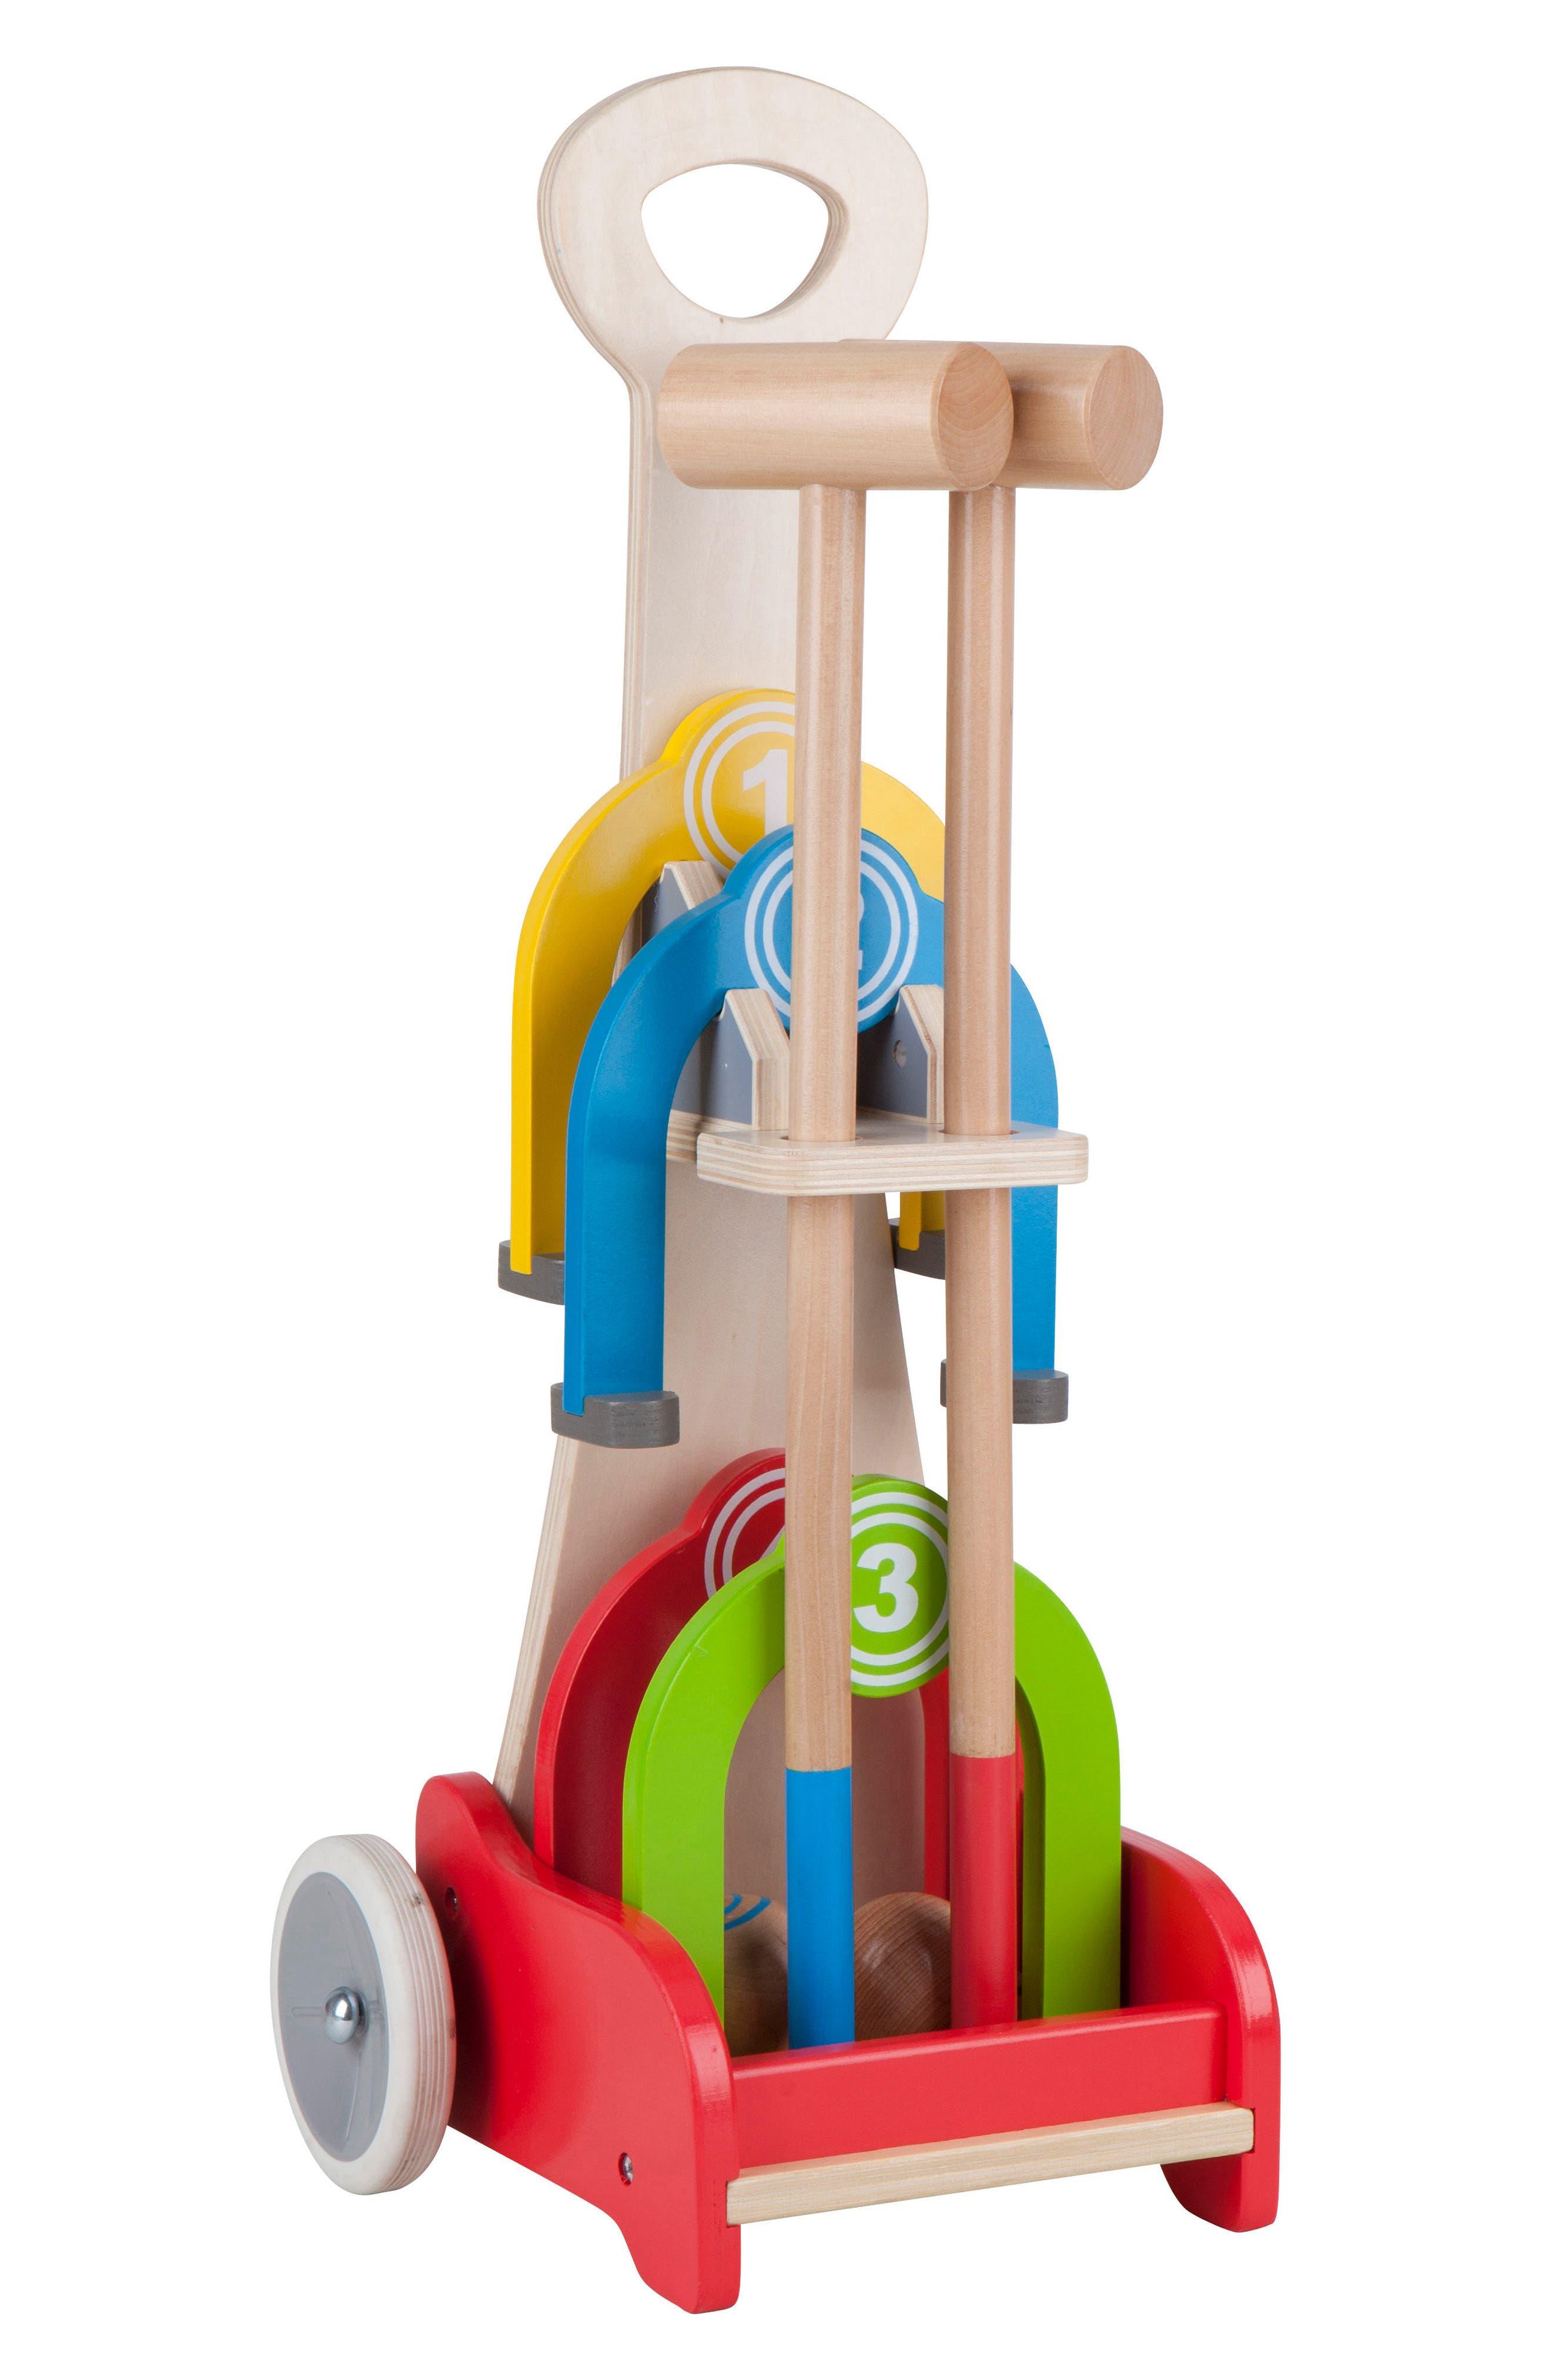 HAPE Rainbow Croquet Caddy Toy Set